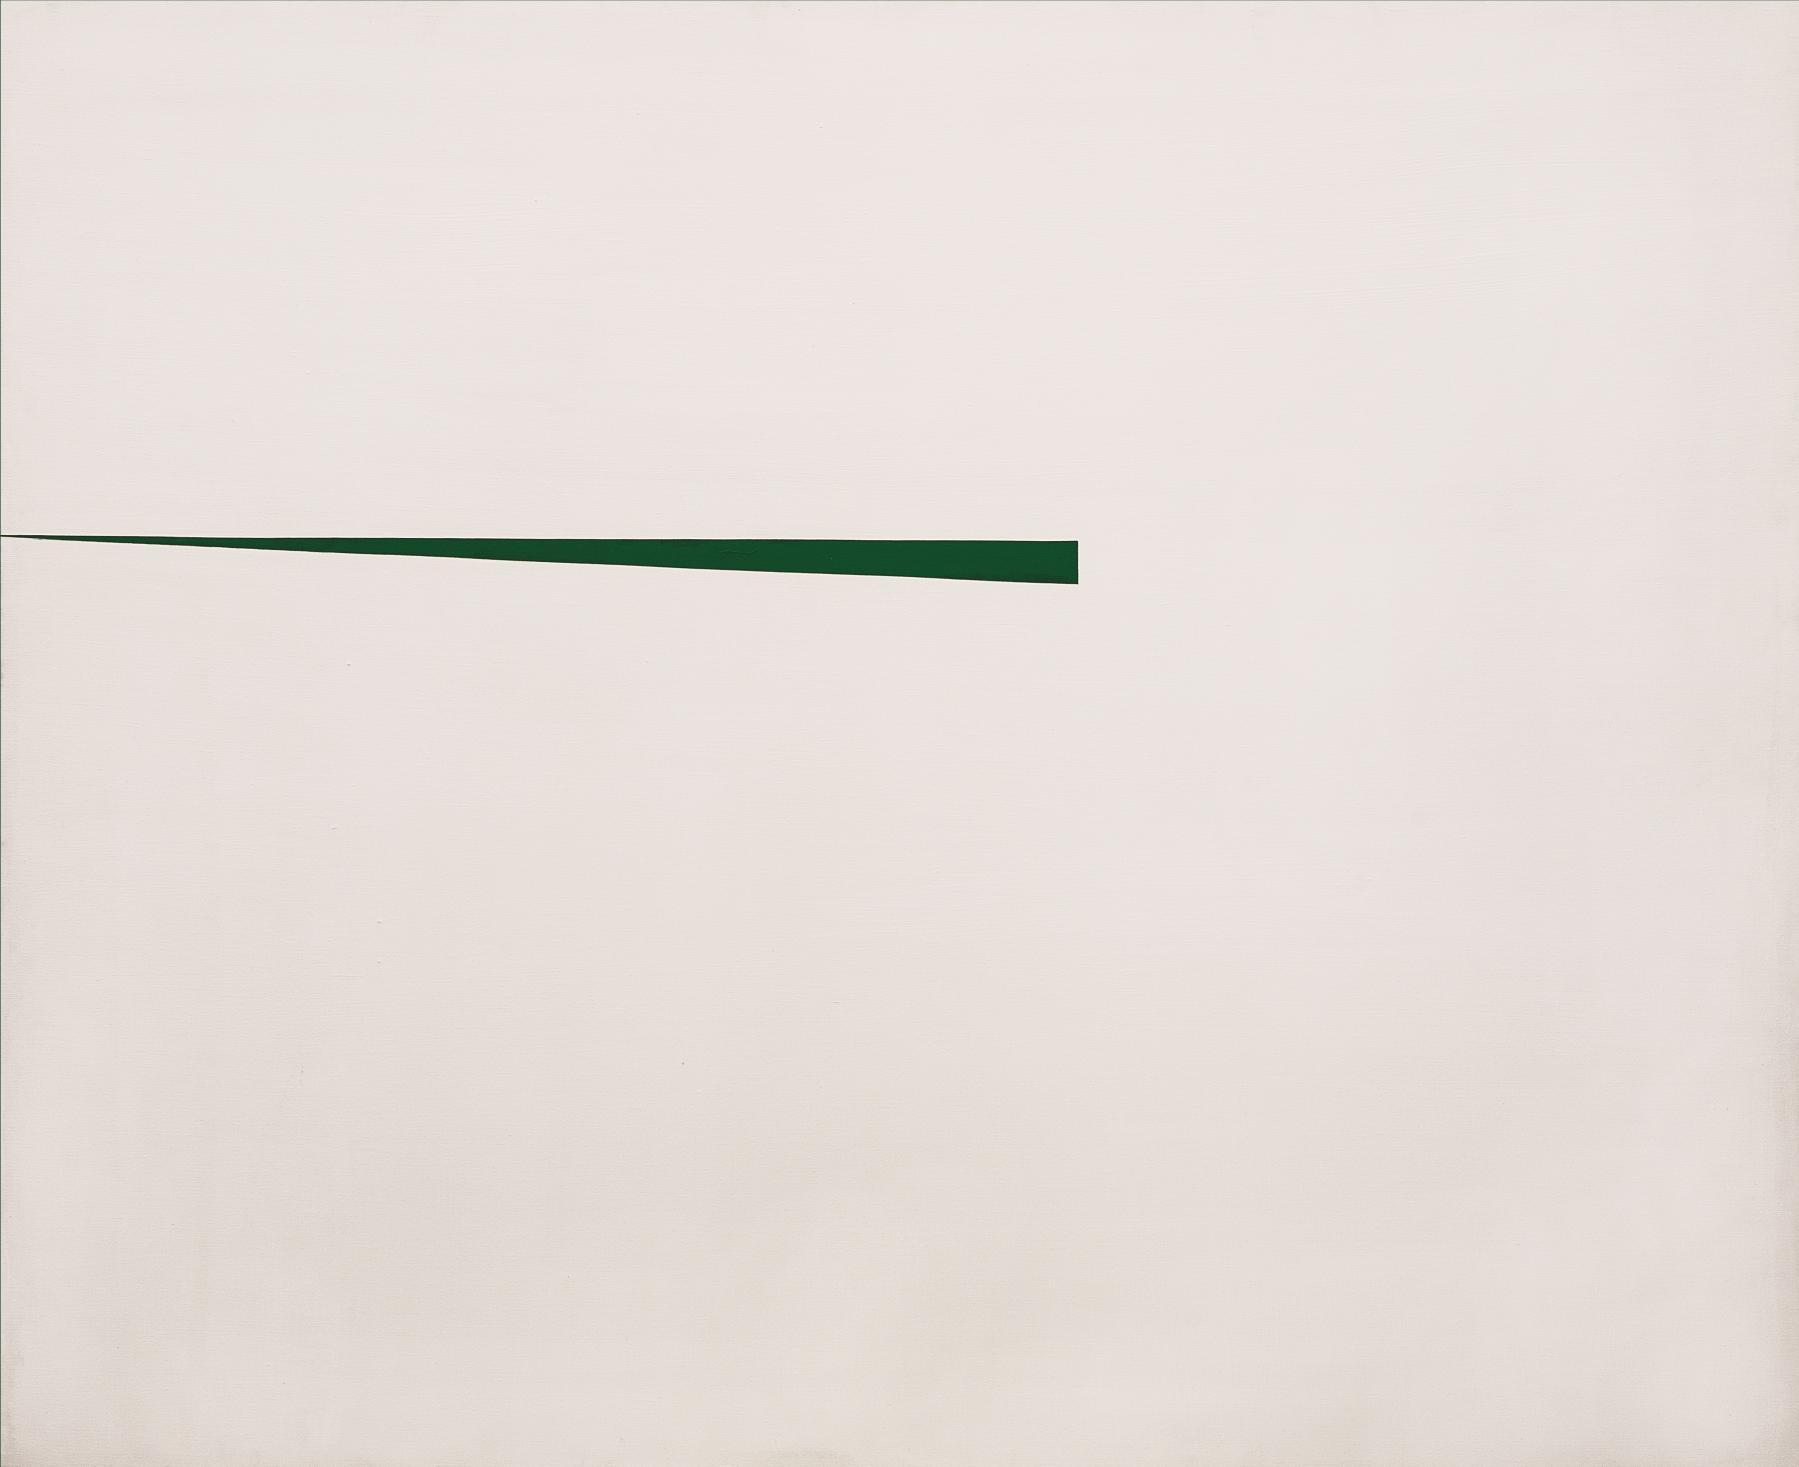 Blanco y Verde (1967) - Carmen Herrera